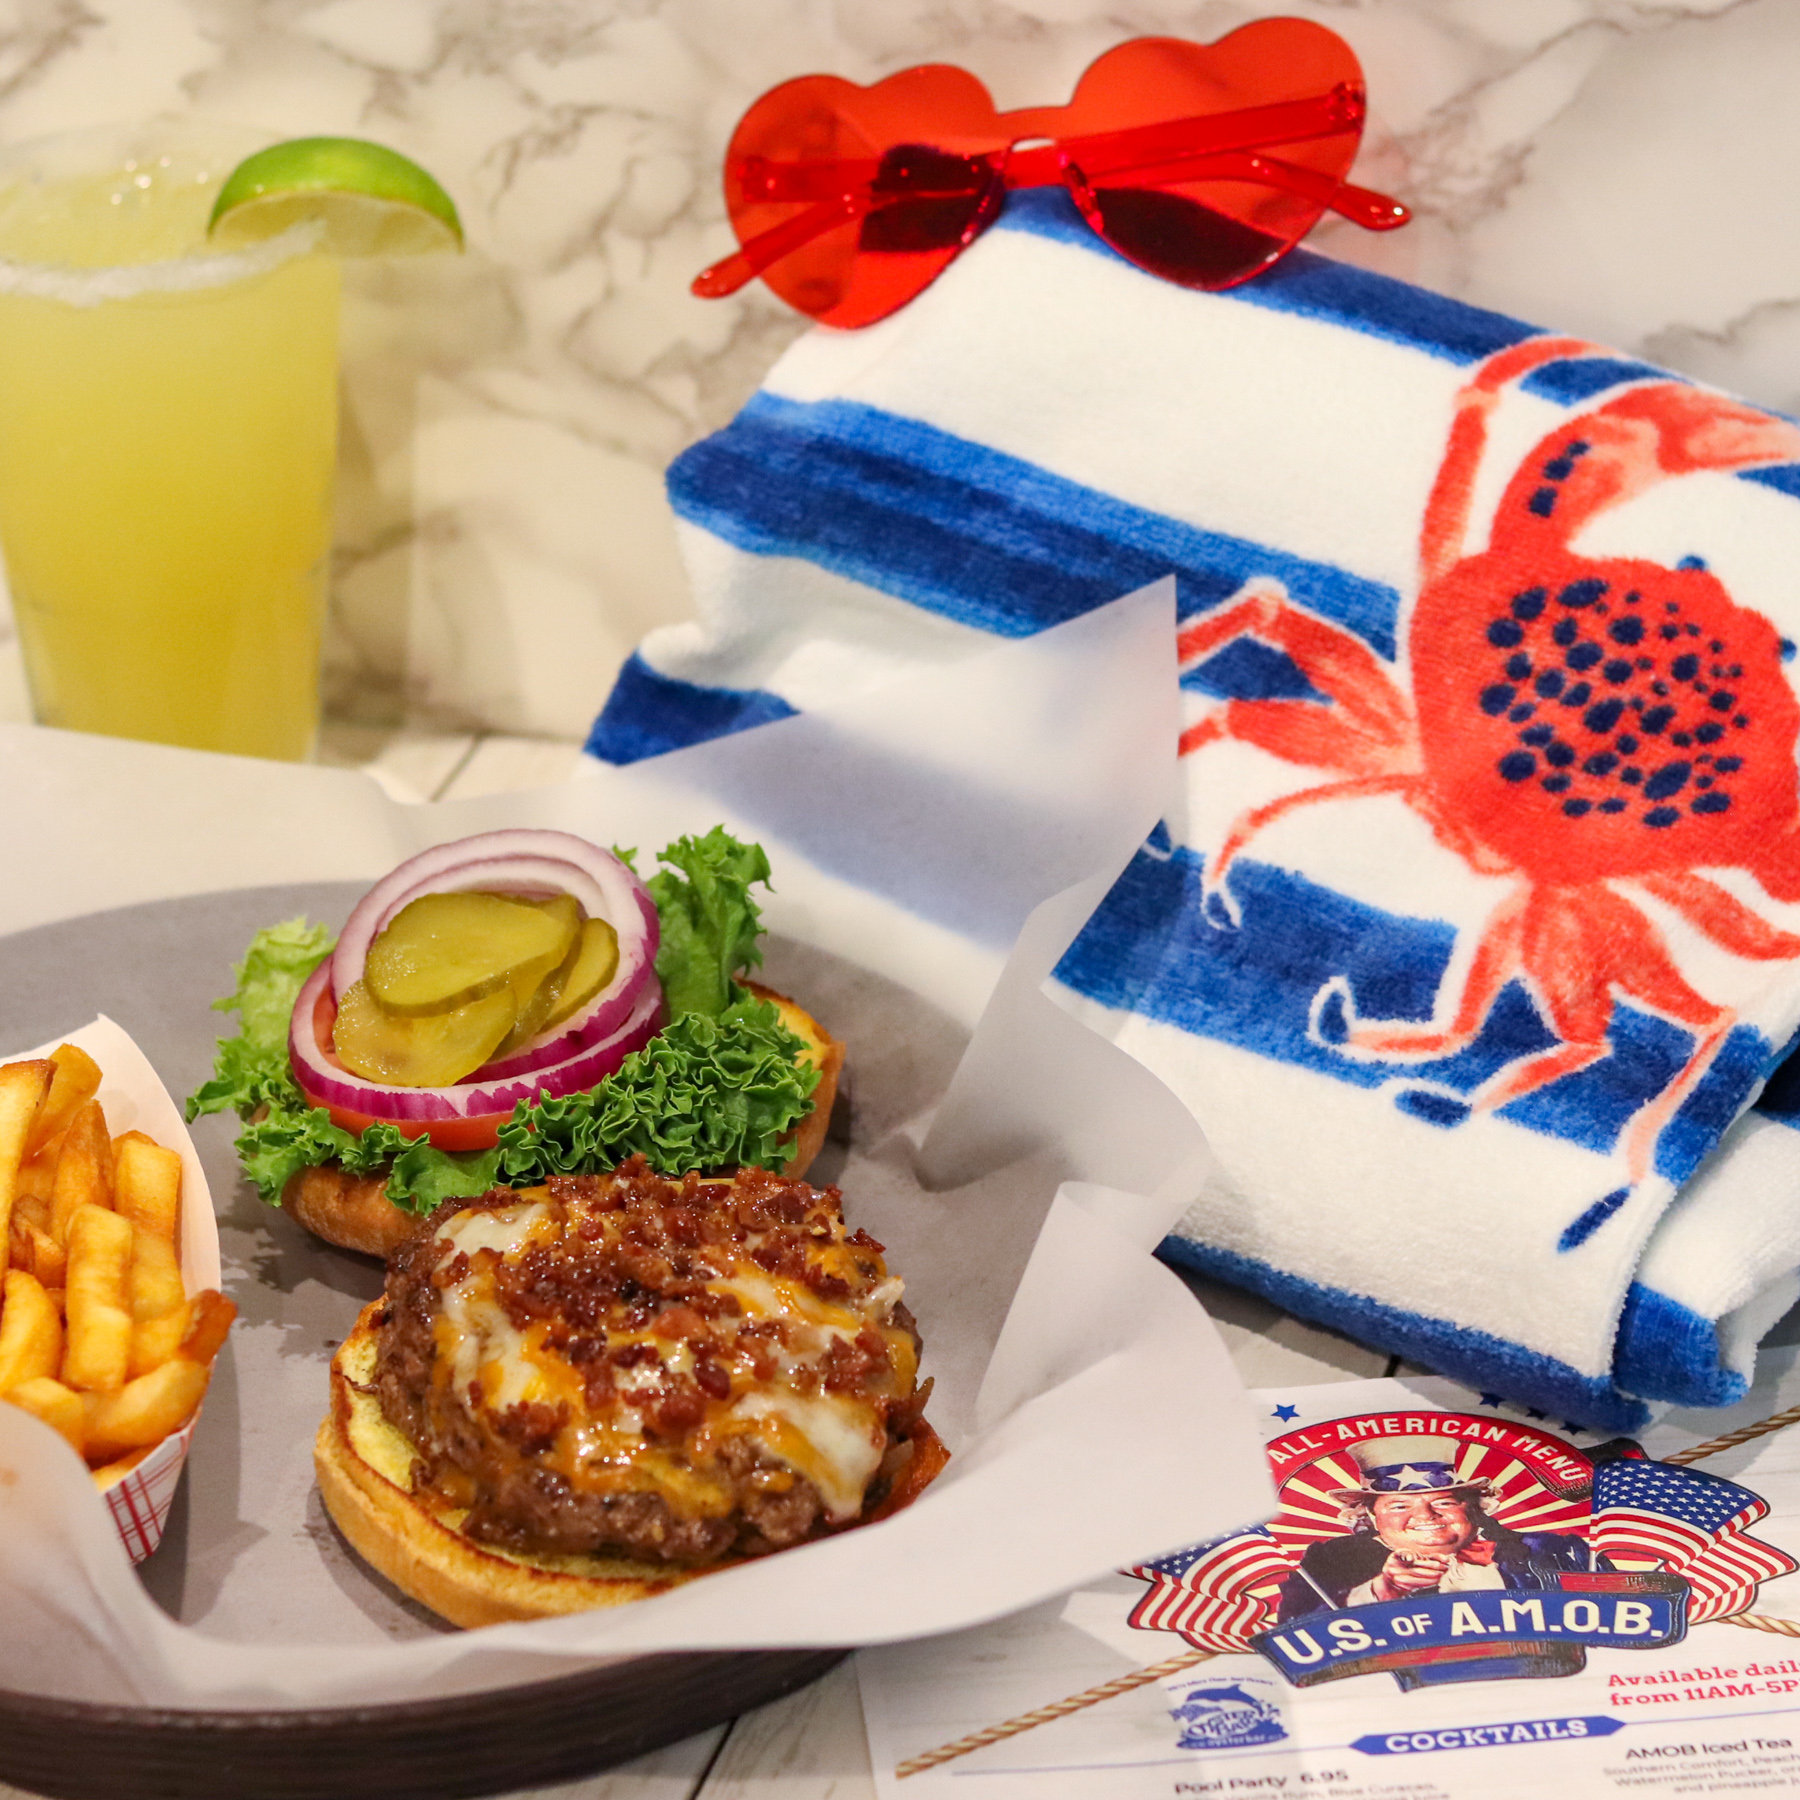 US of AMOB Seasonal menu All American Burger